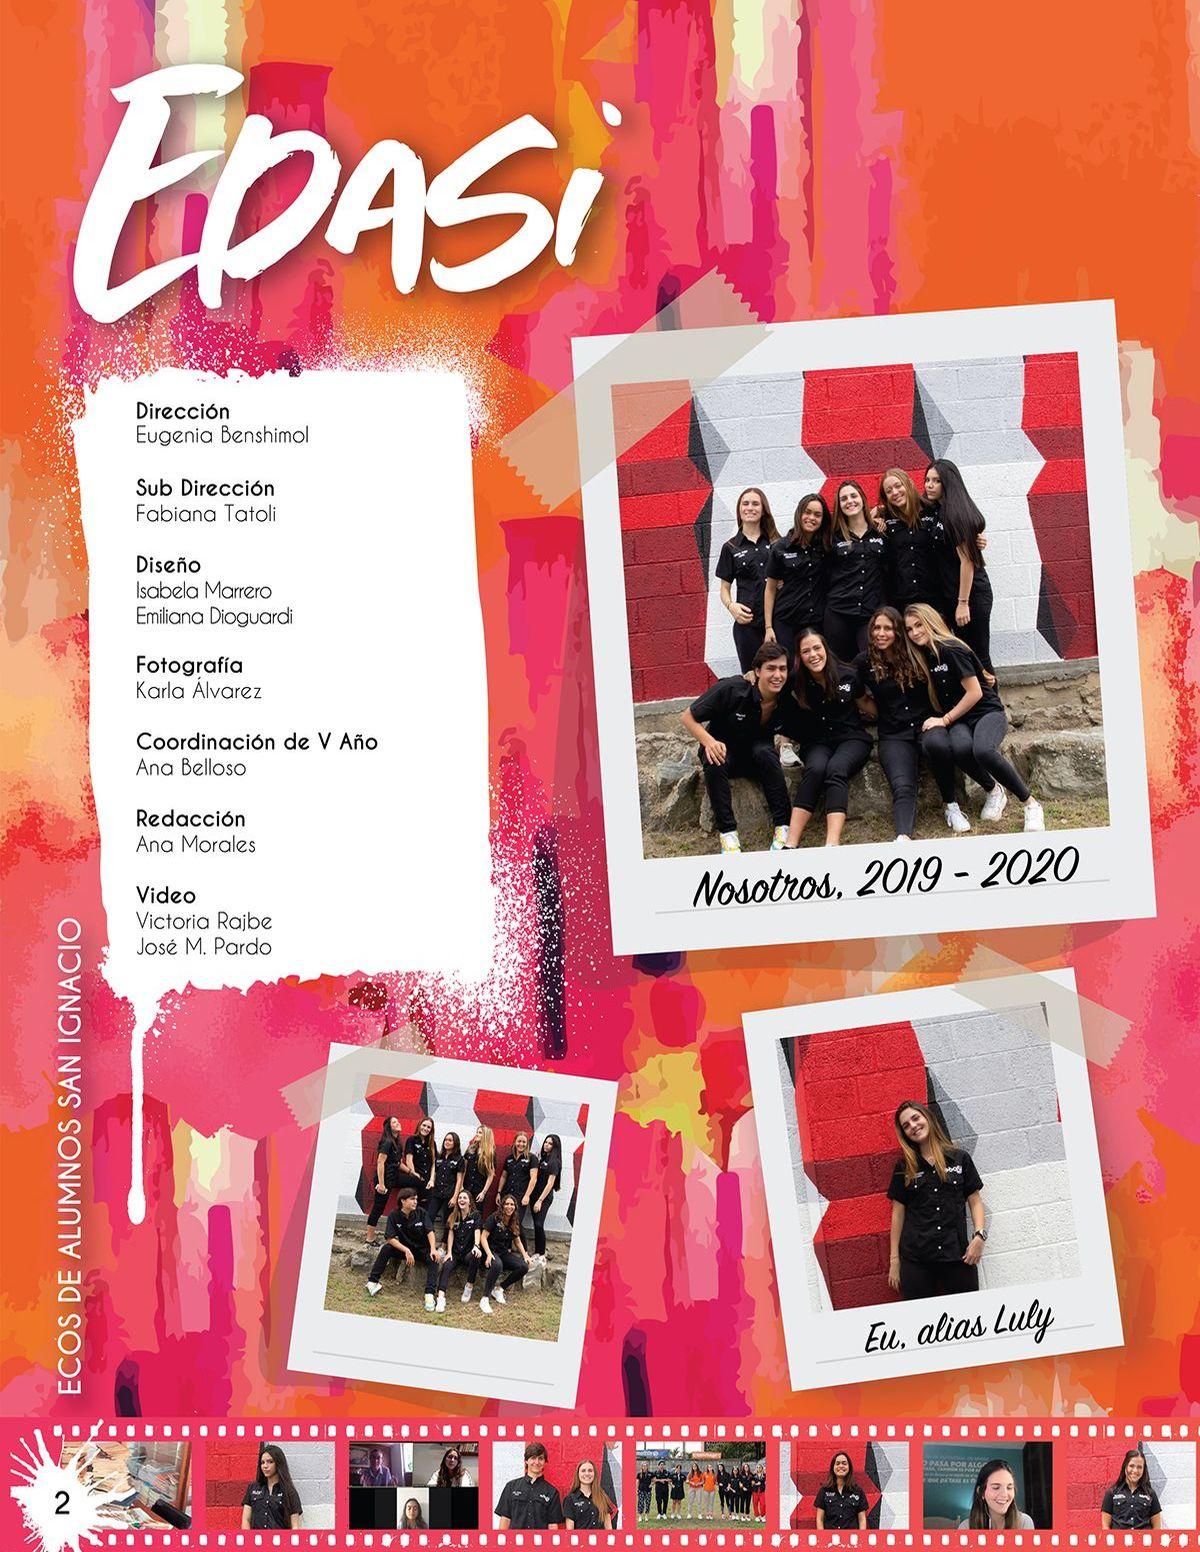 Edasi 2020 - página 2